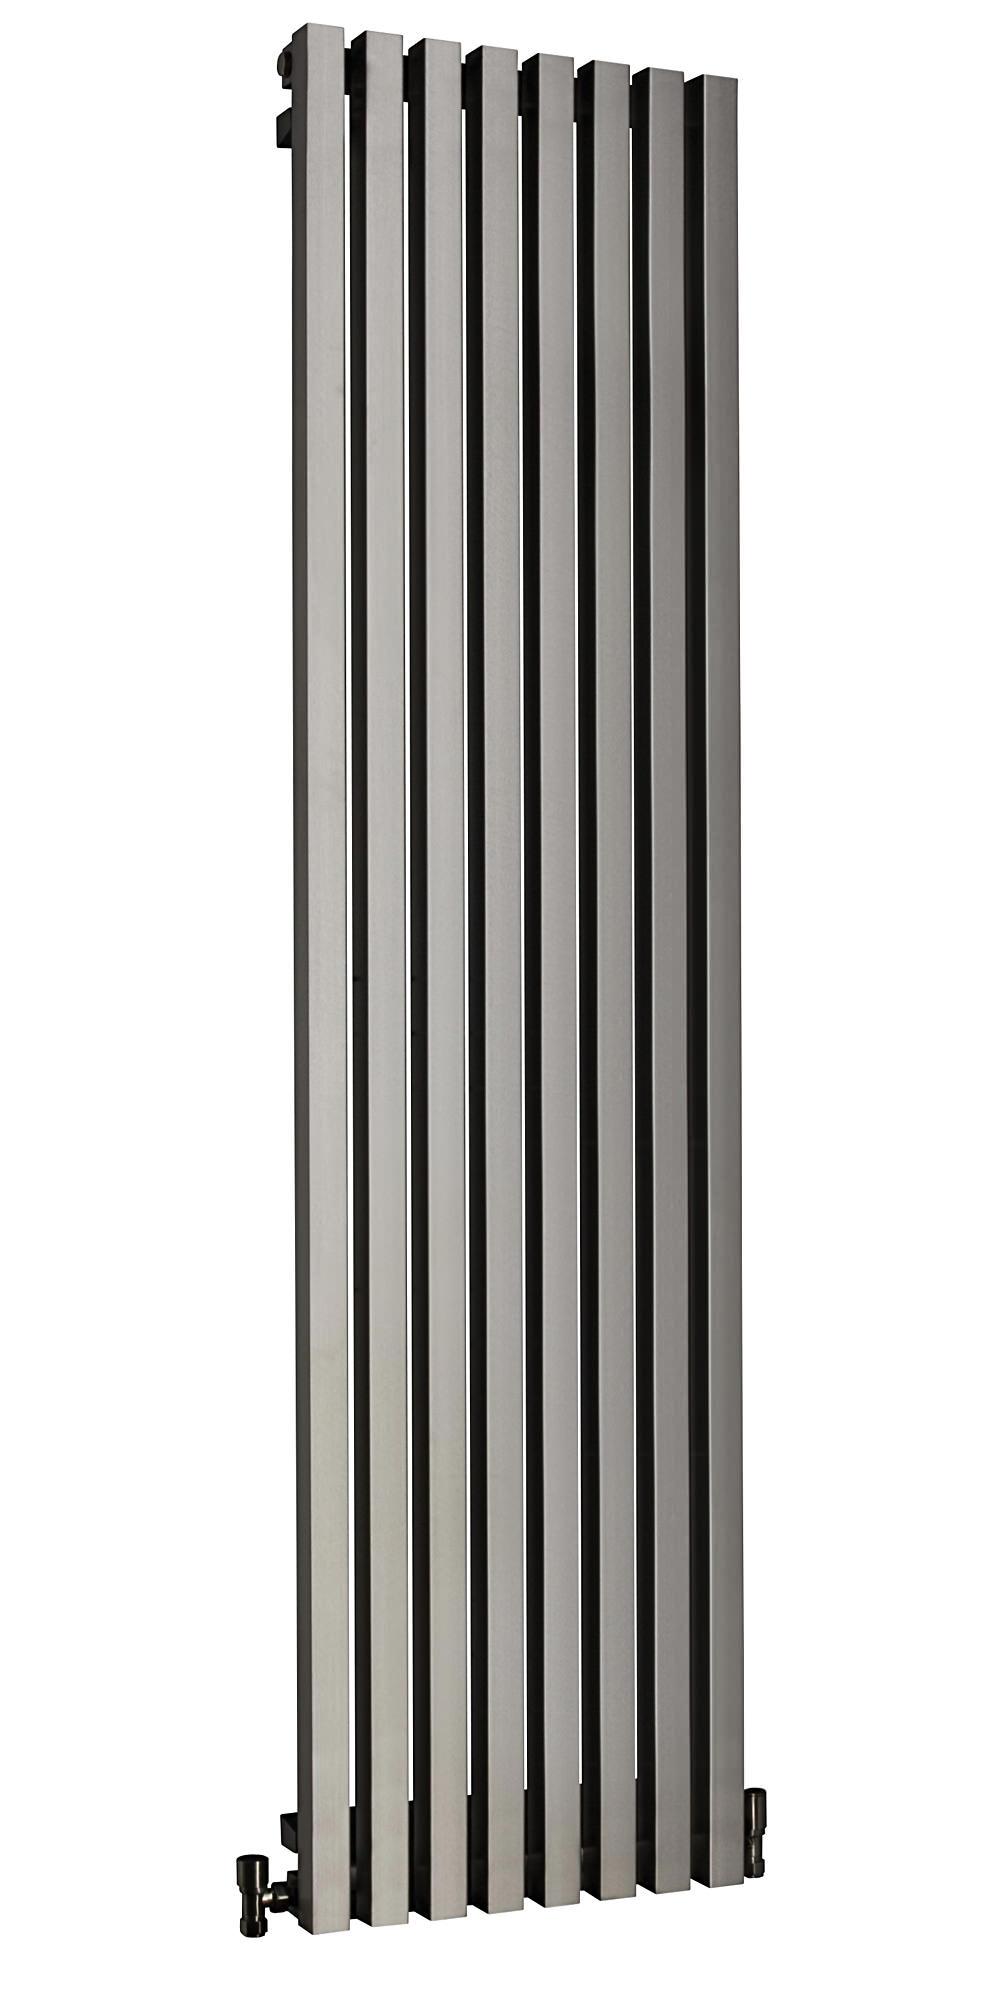 Dq Heating Dune Brushed Stainless Steel Radiator 280 X 1600mm